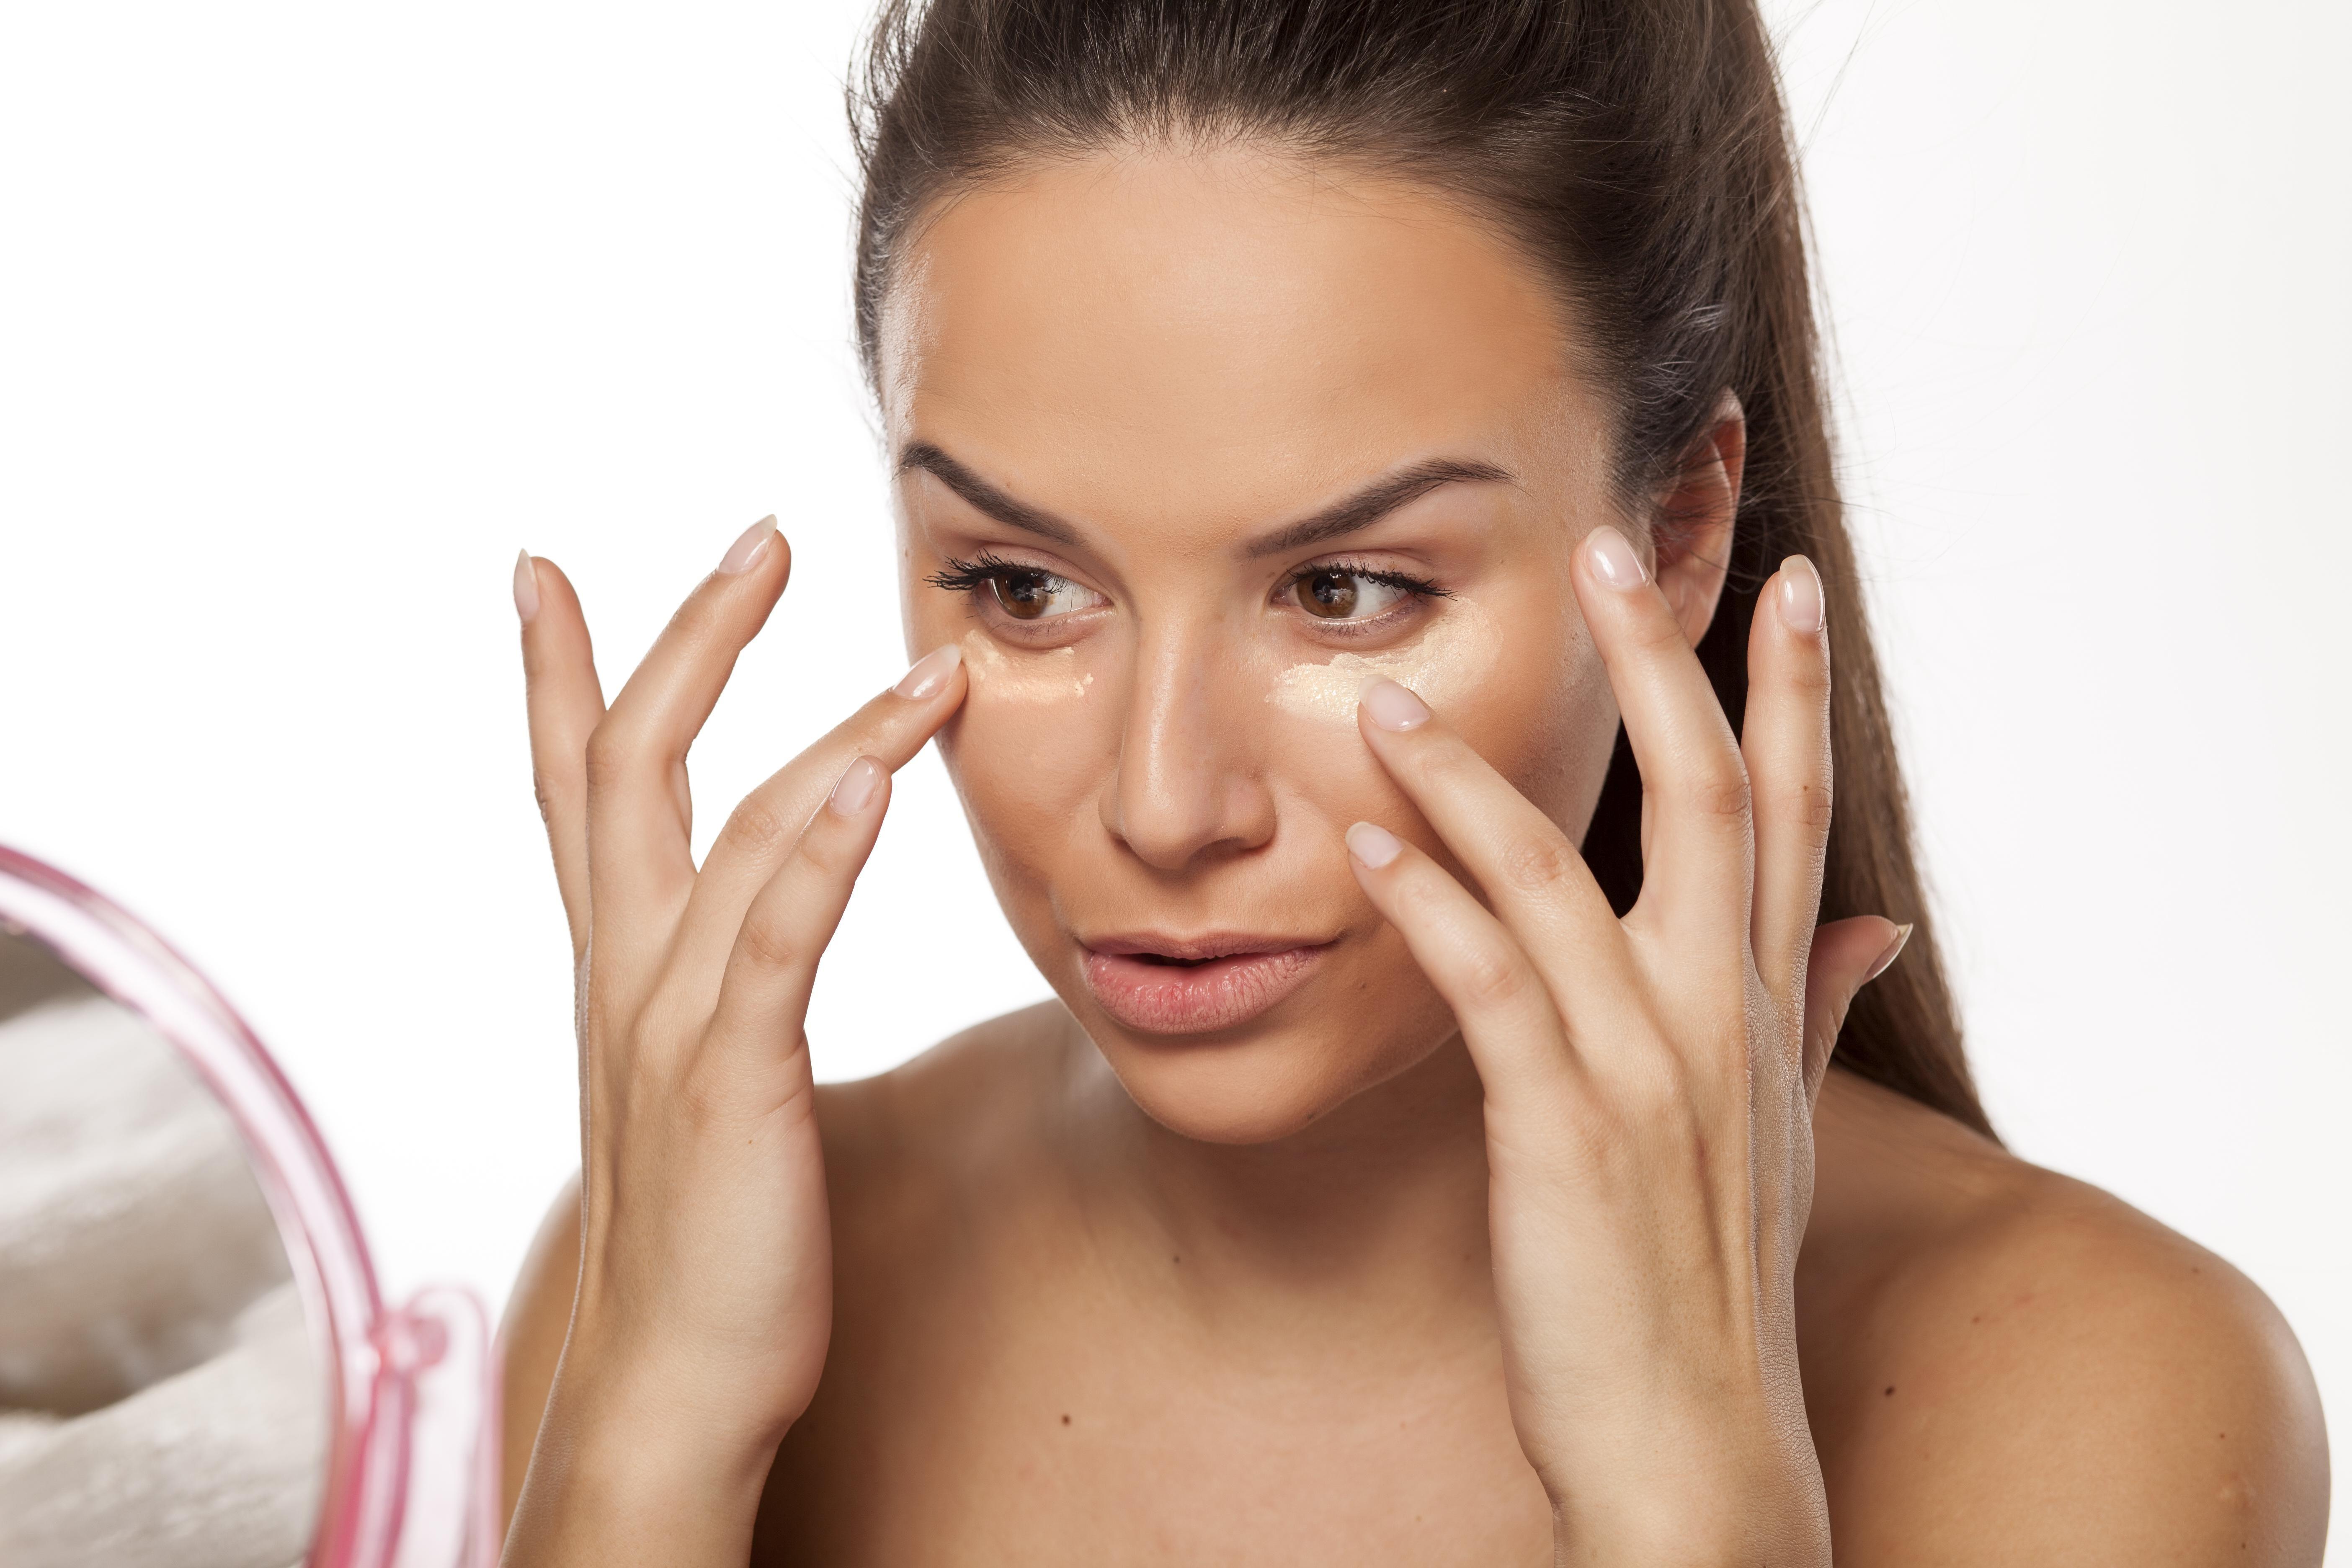 Using Primer Before Applying Makeup